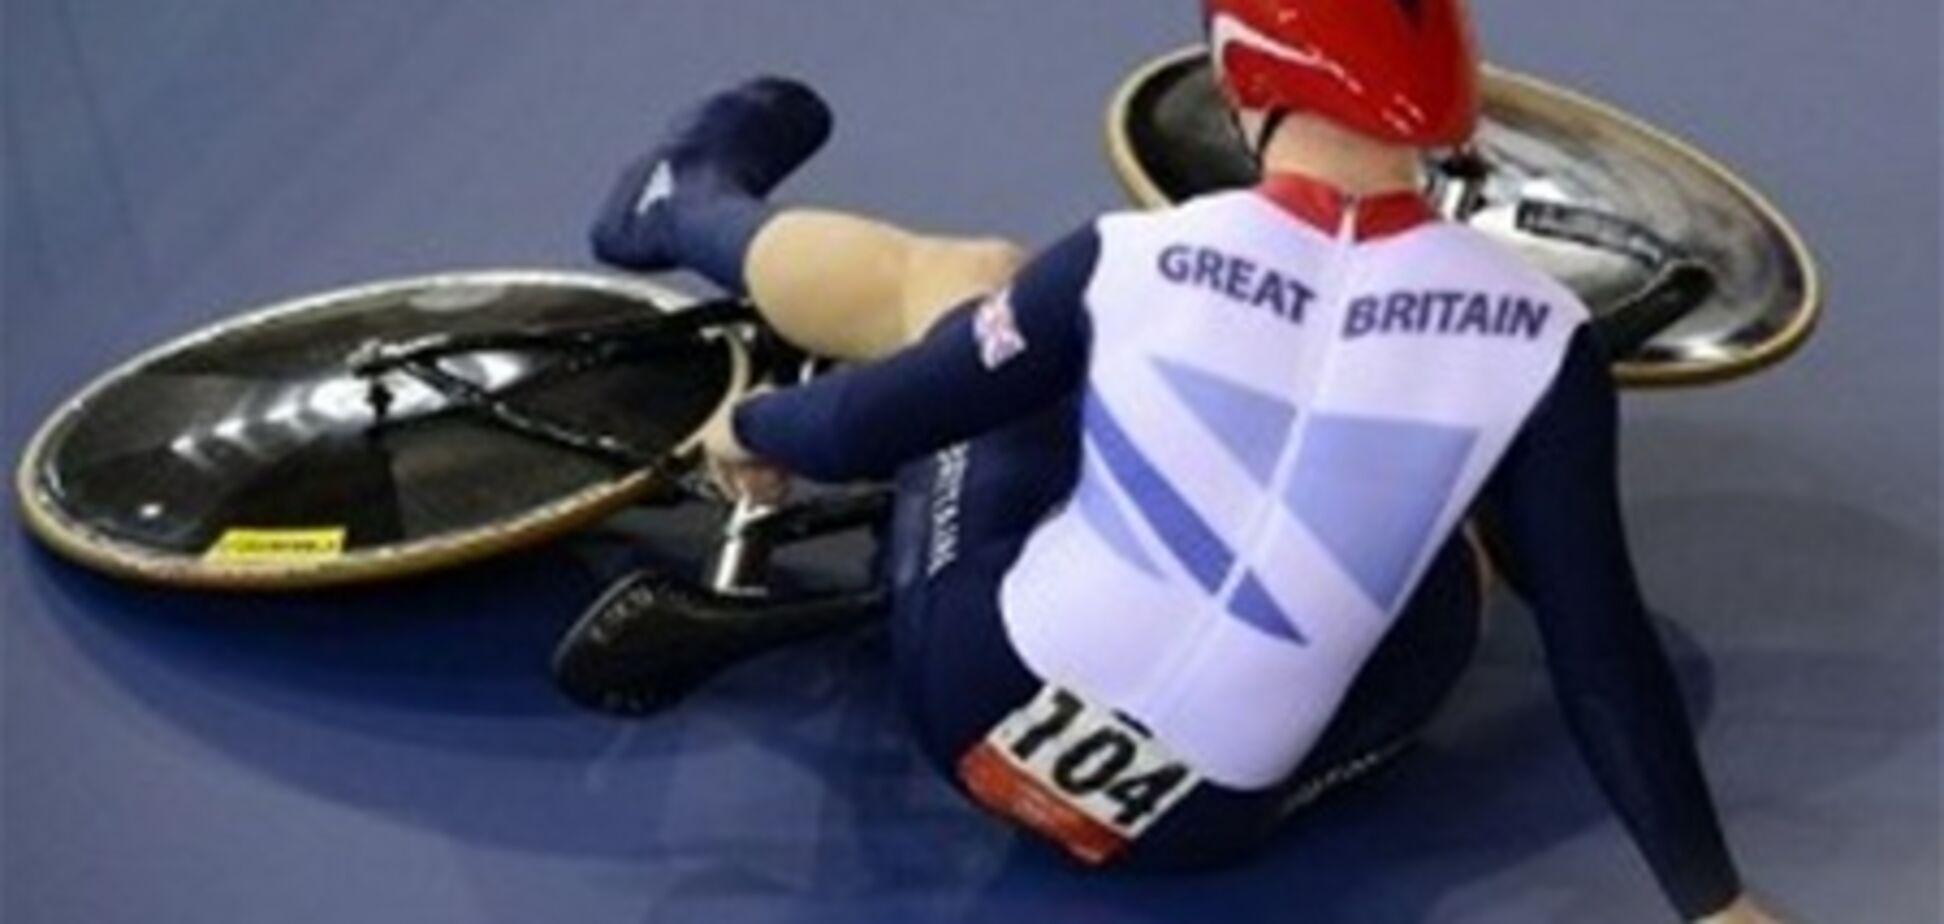 У олимпийского чемпиона по велоспорту украли велосипед